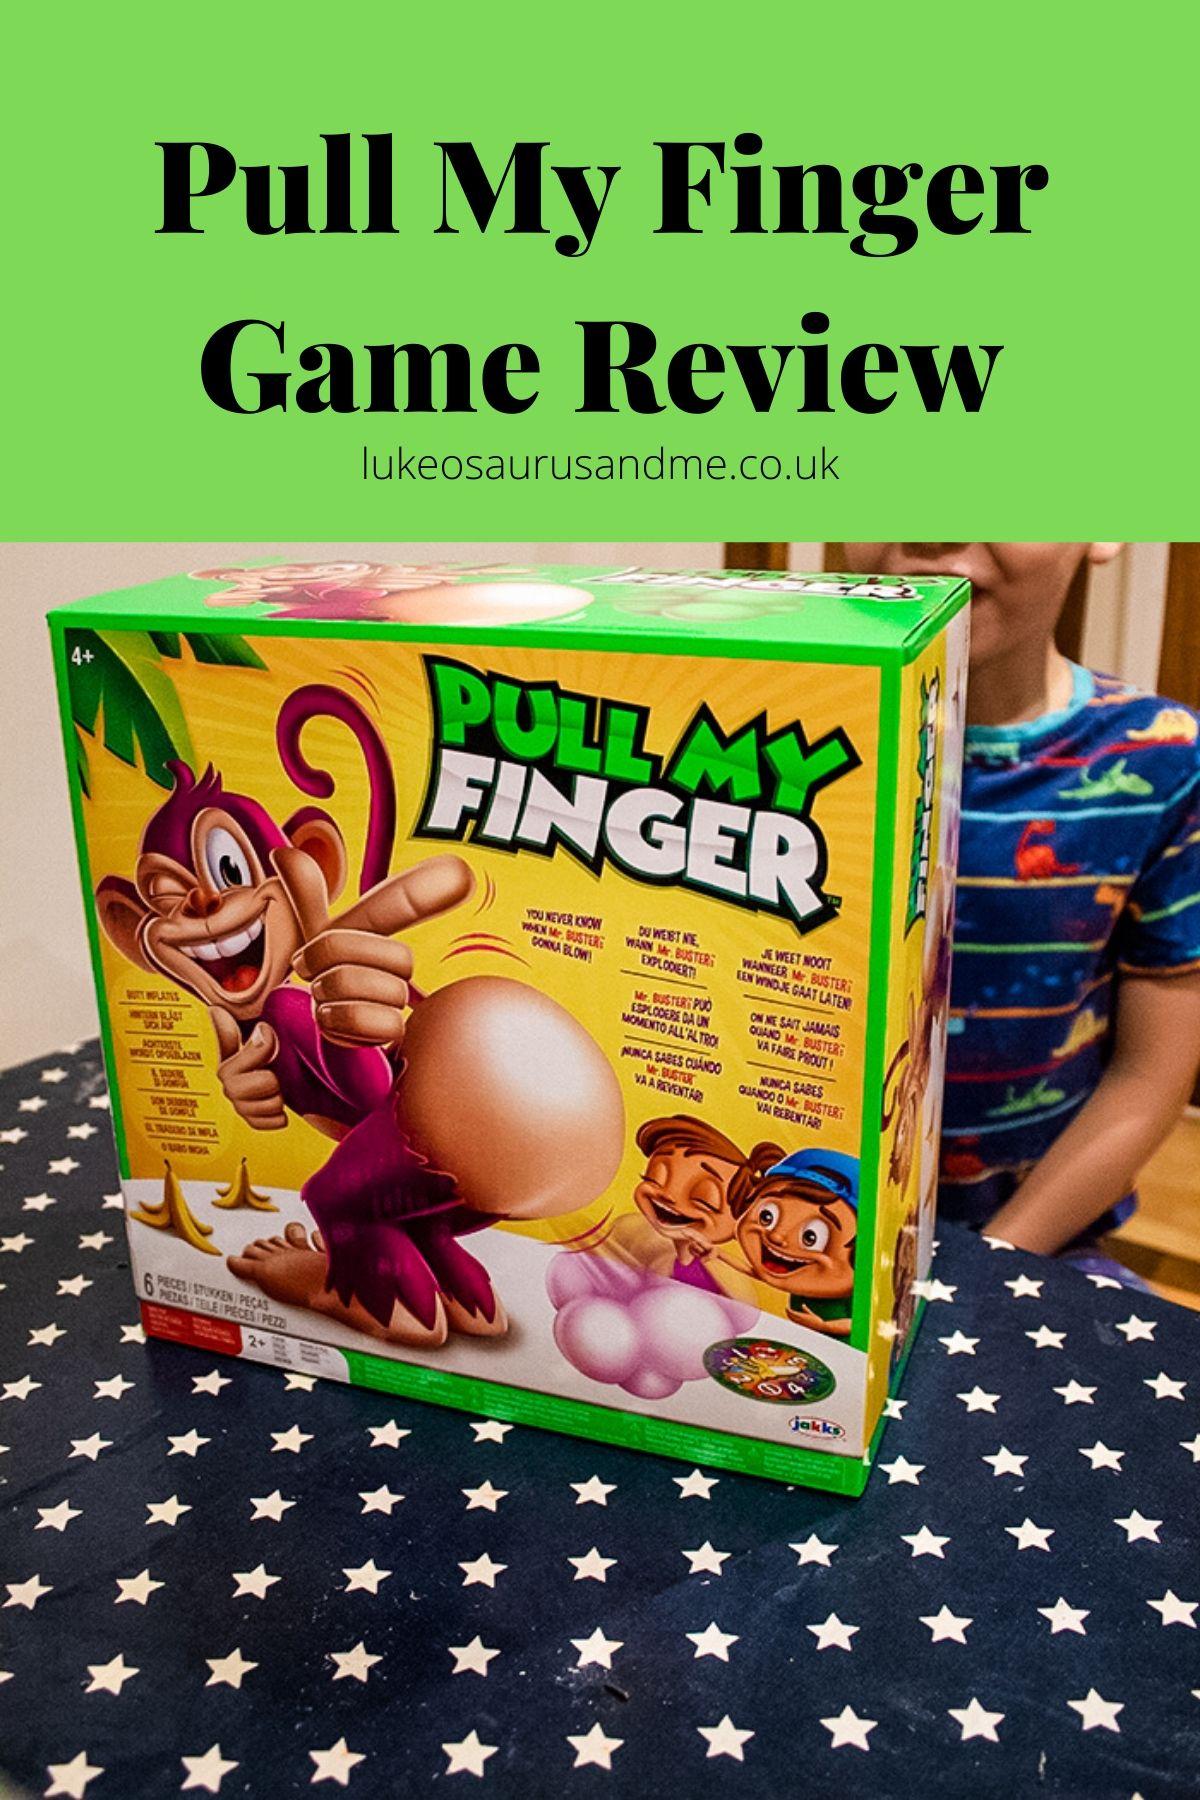 Pull My Finger box.